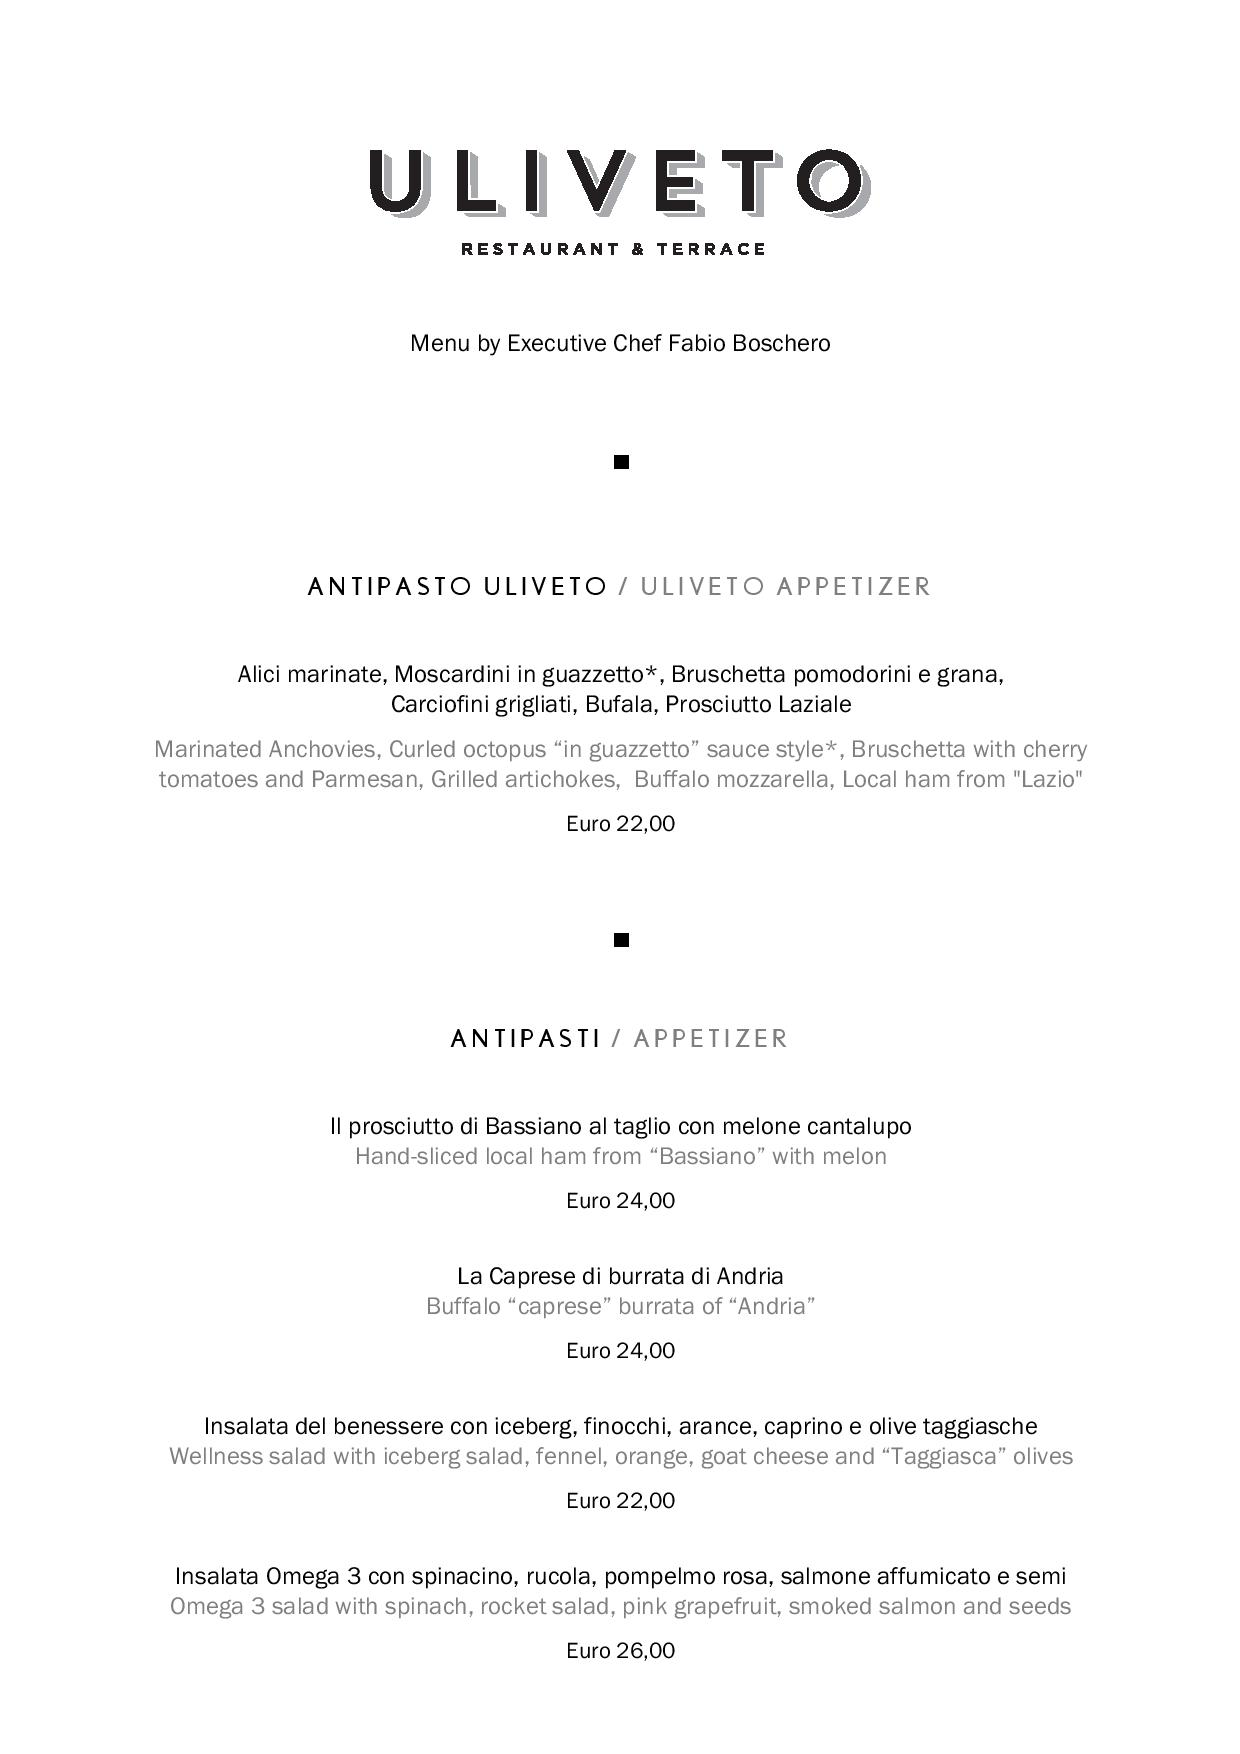 Uliveto food page 001 1 - REVIEW - Rome Cavalieri a Waldorf Astoria Hotel : Premium Rome View Room [COVID-era]